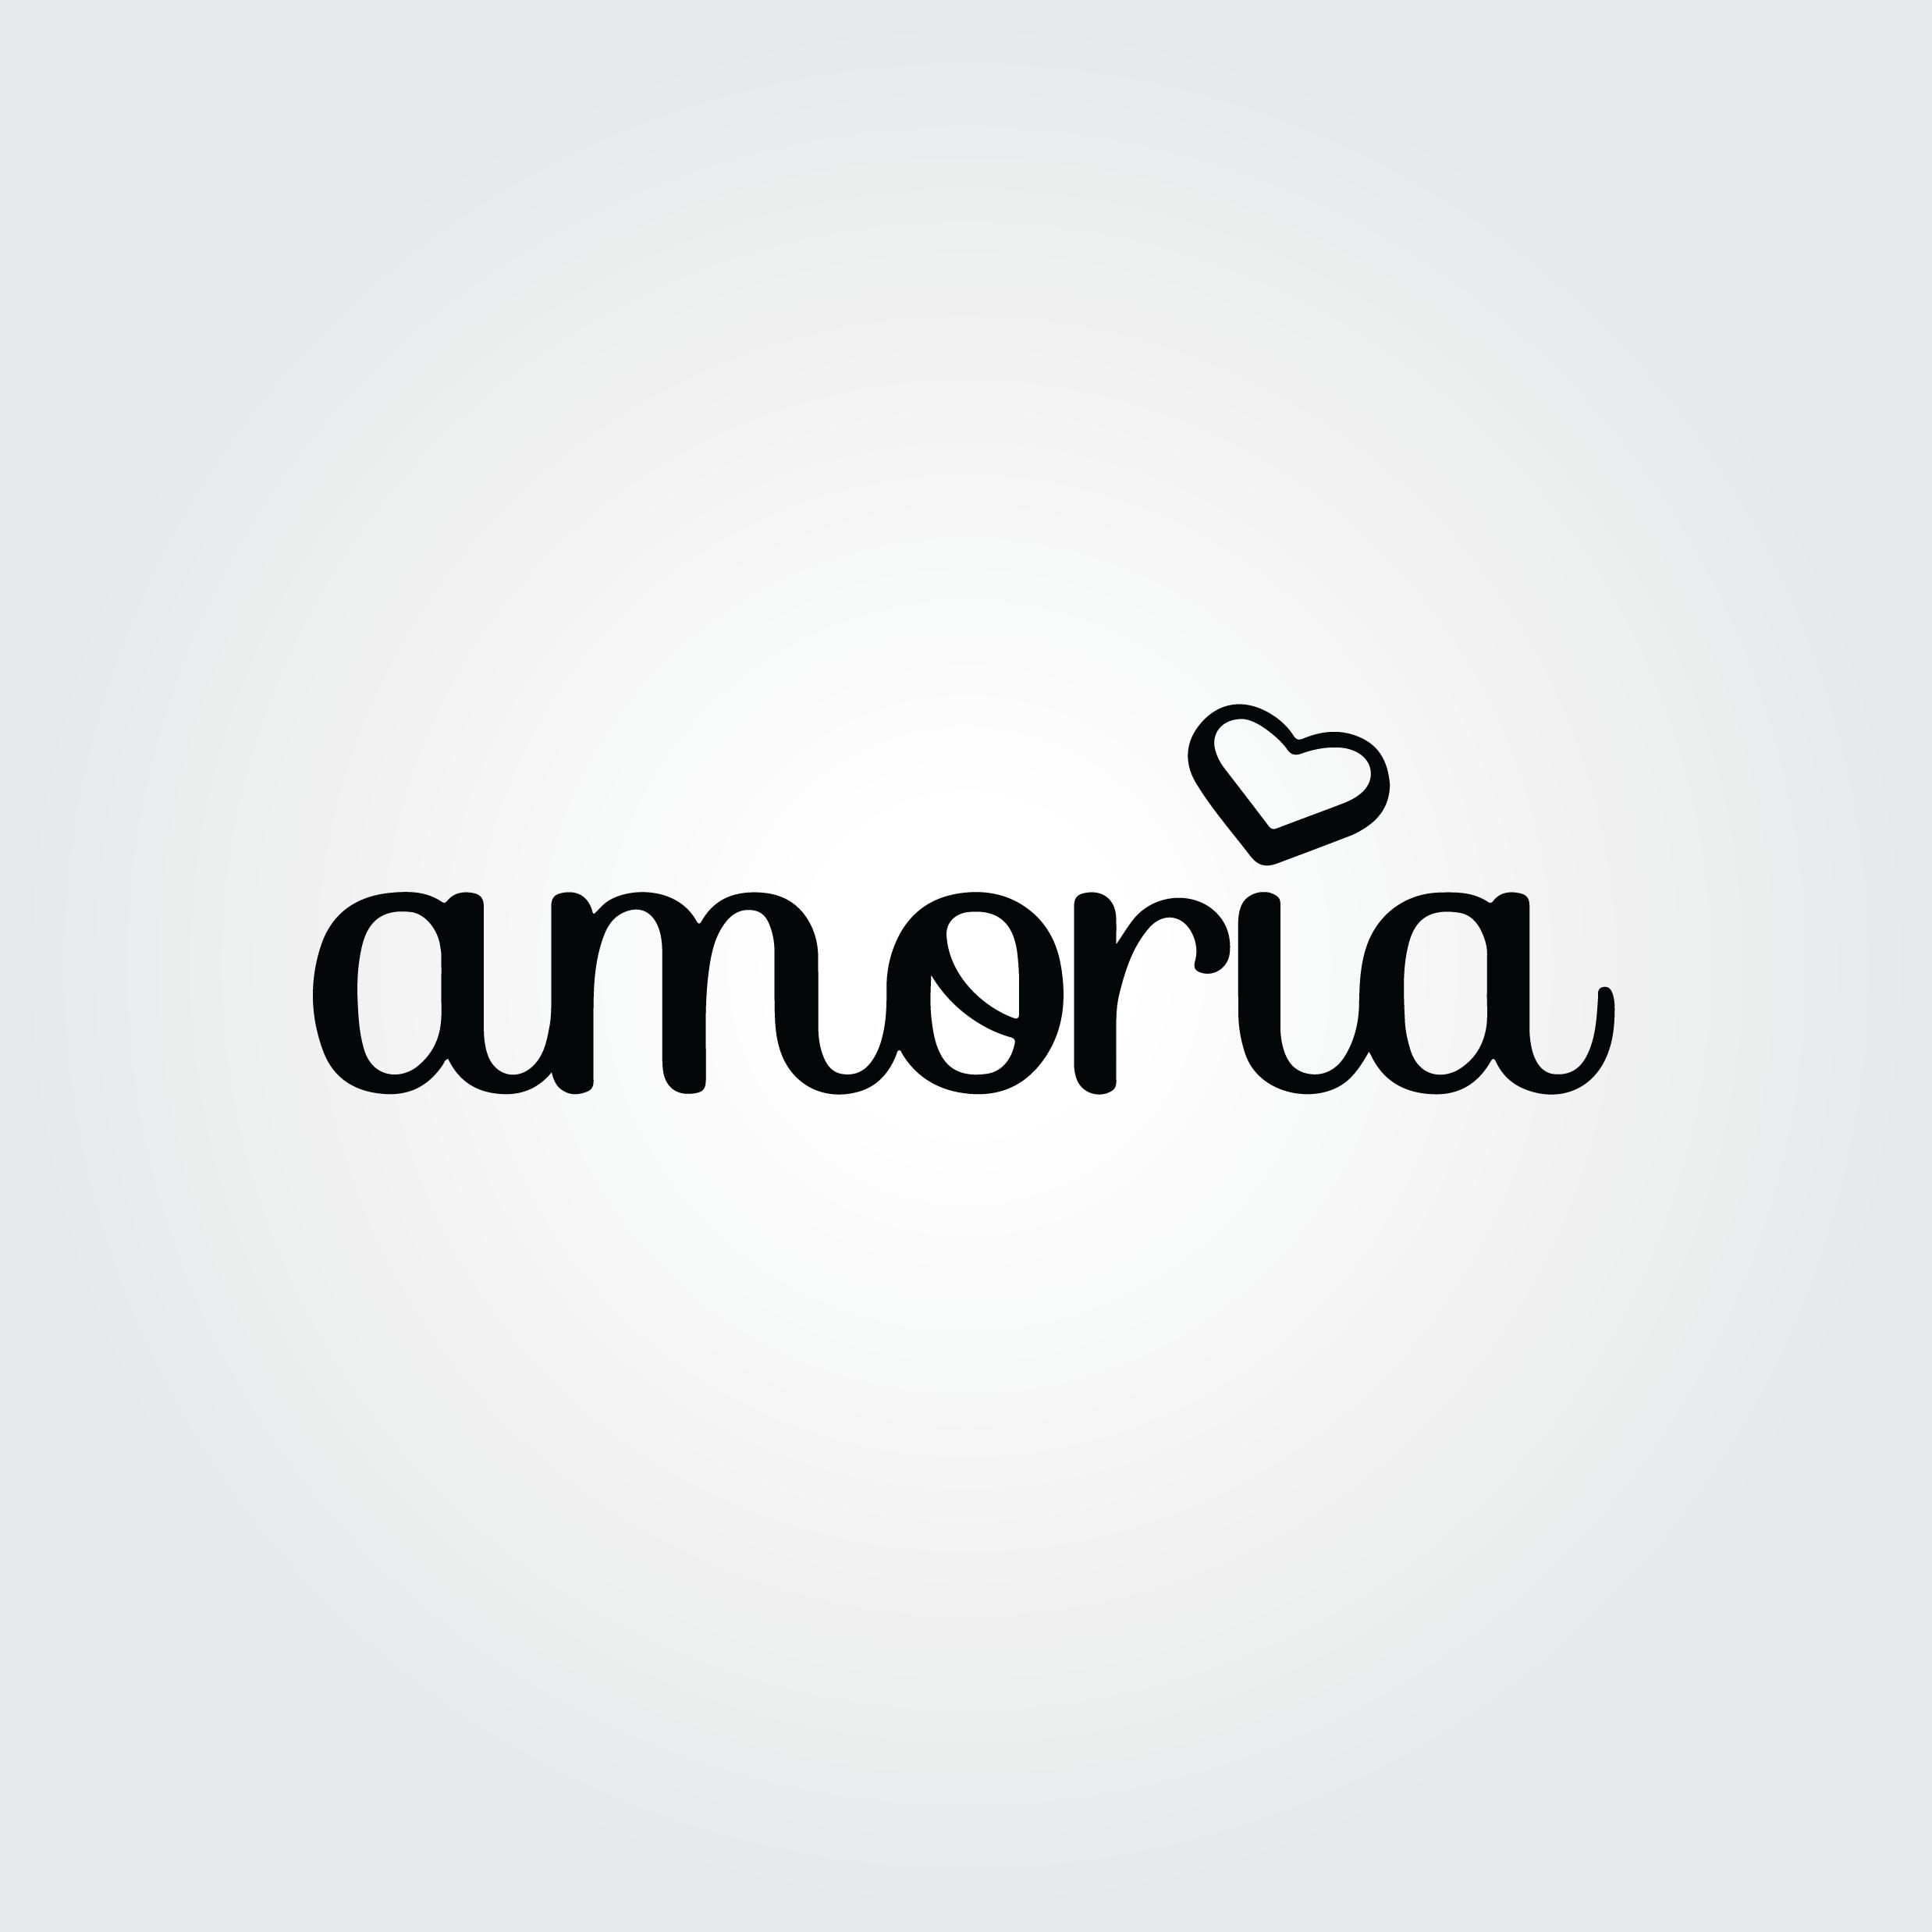 Amoria